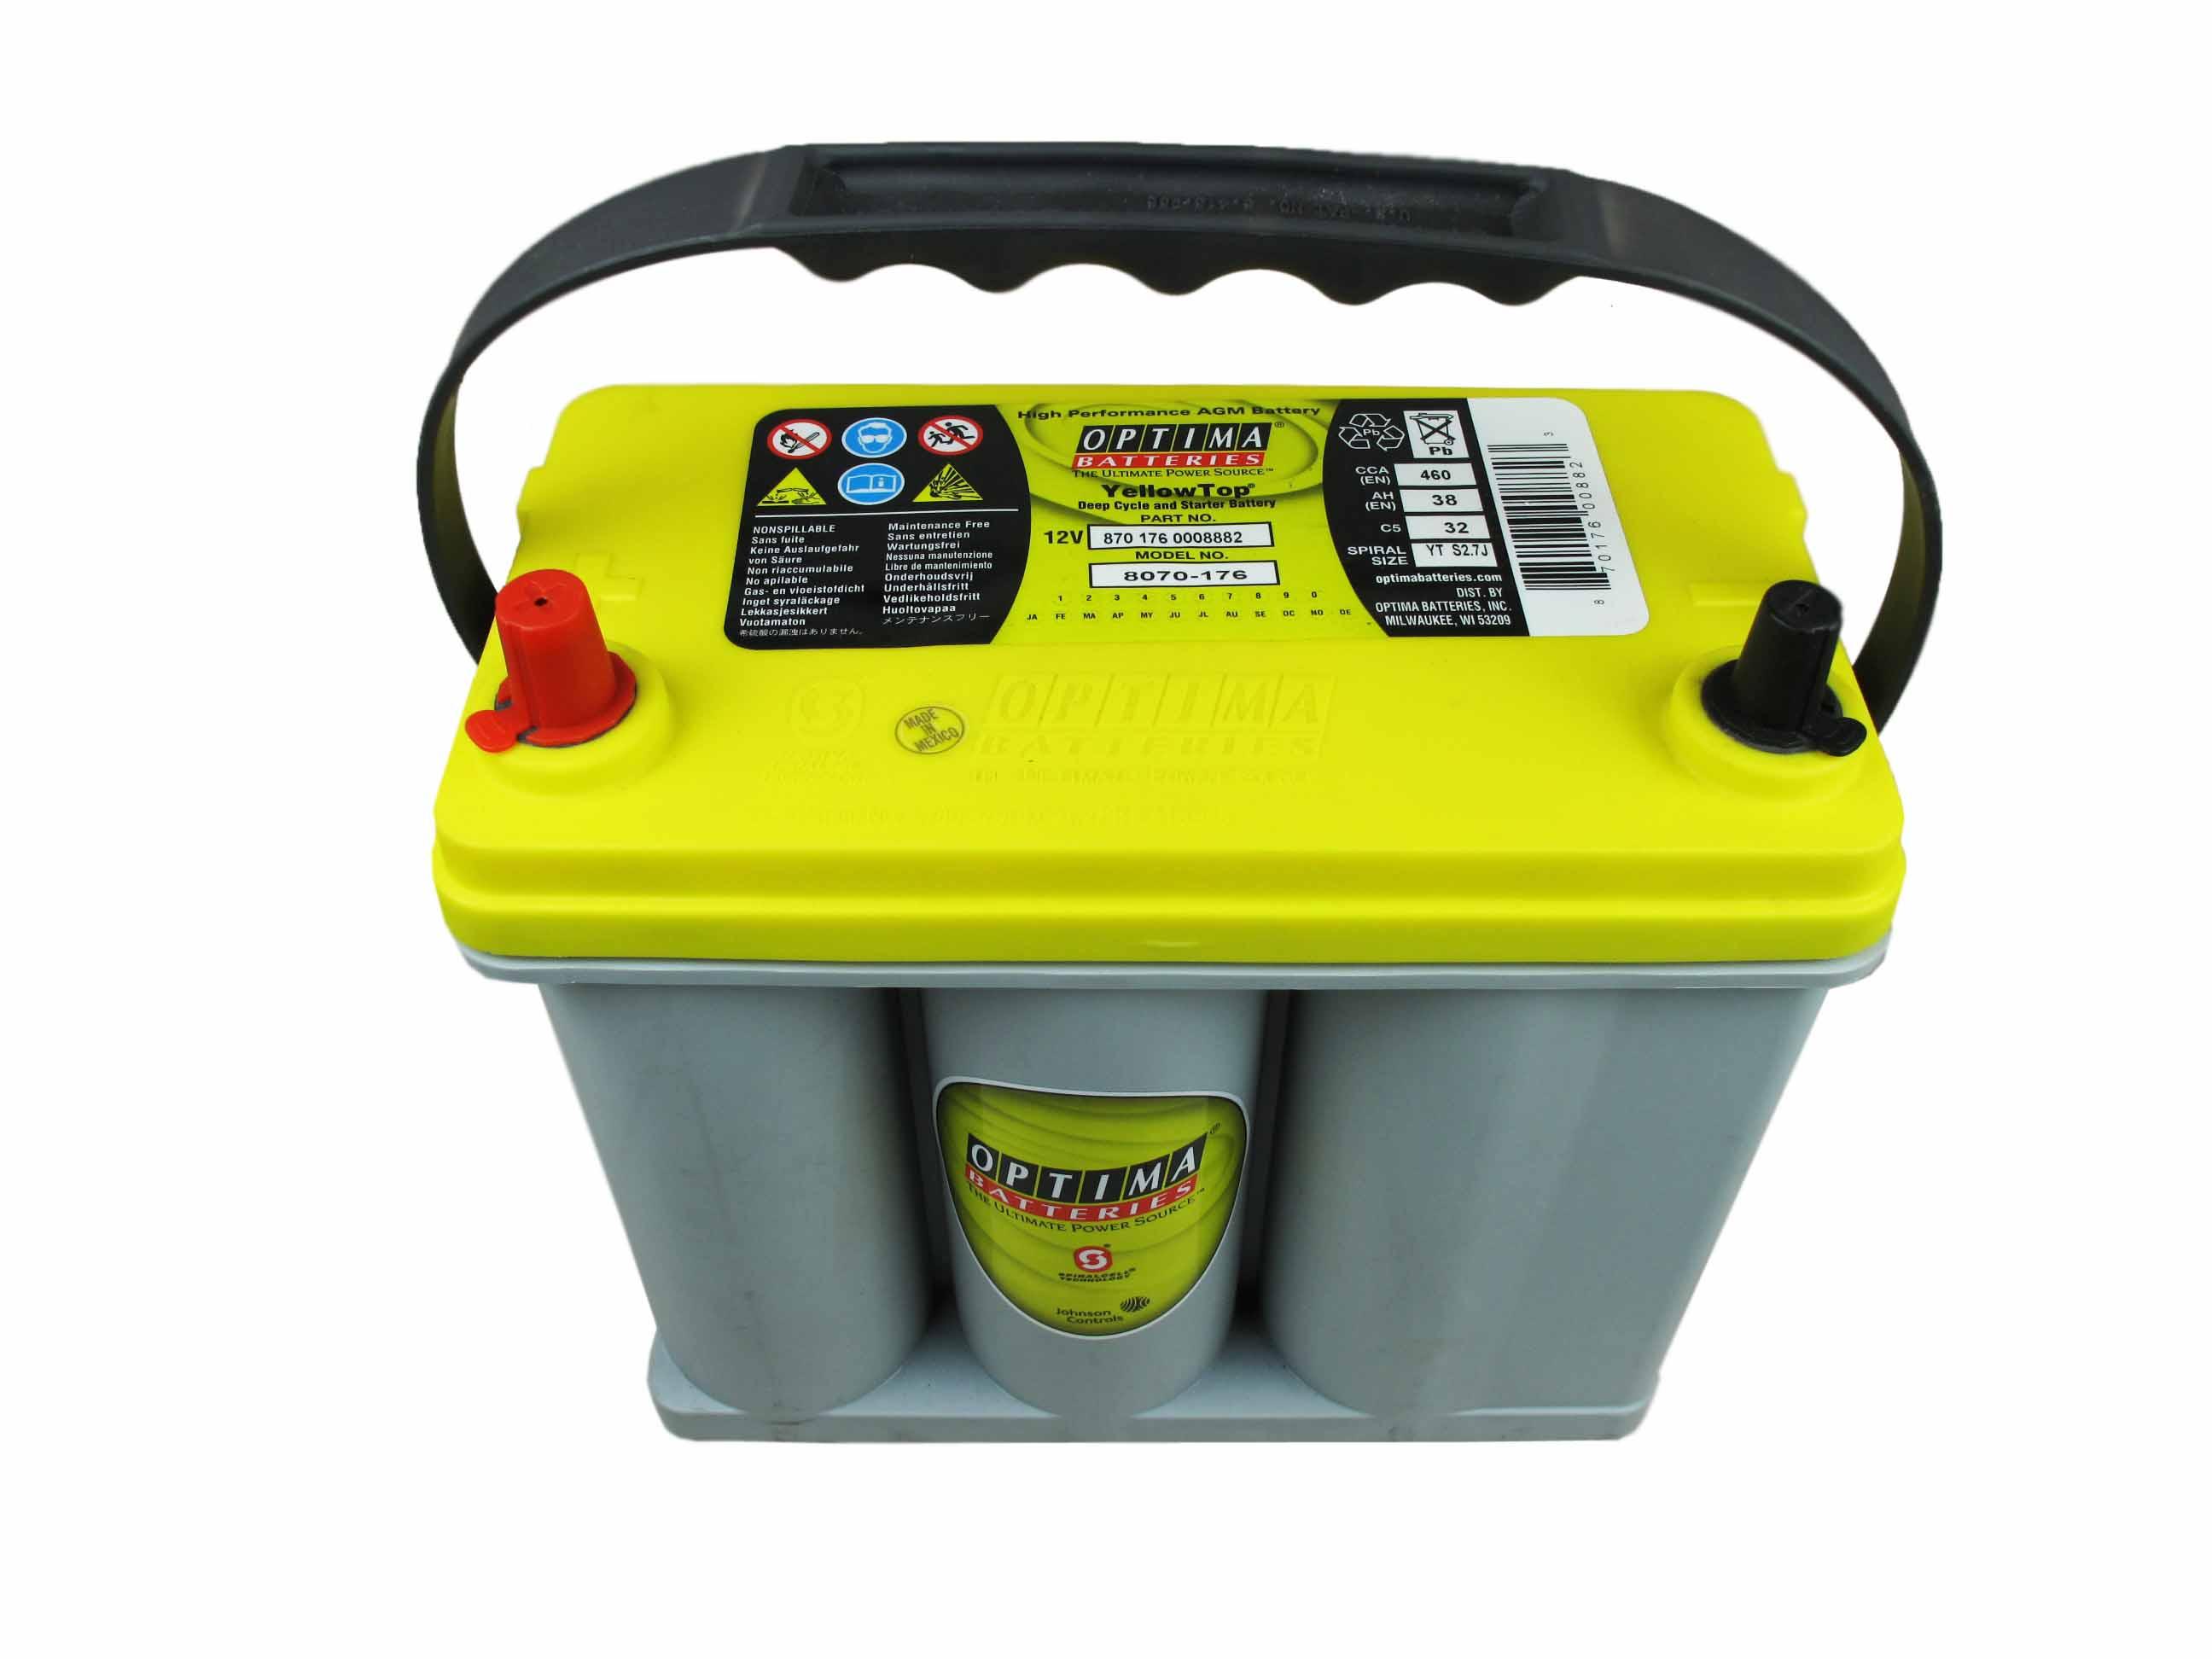 OPTIMA Optima Yellow - 12v 38ah - autó akkumulátor - bal+ *ázsia *S - 2,7J